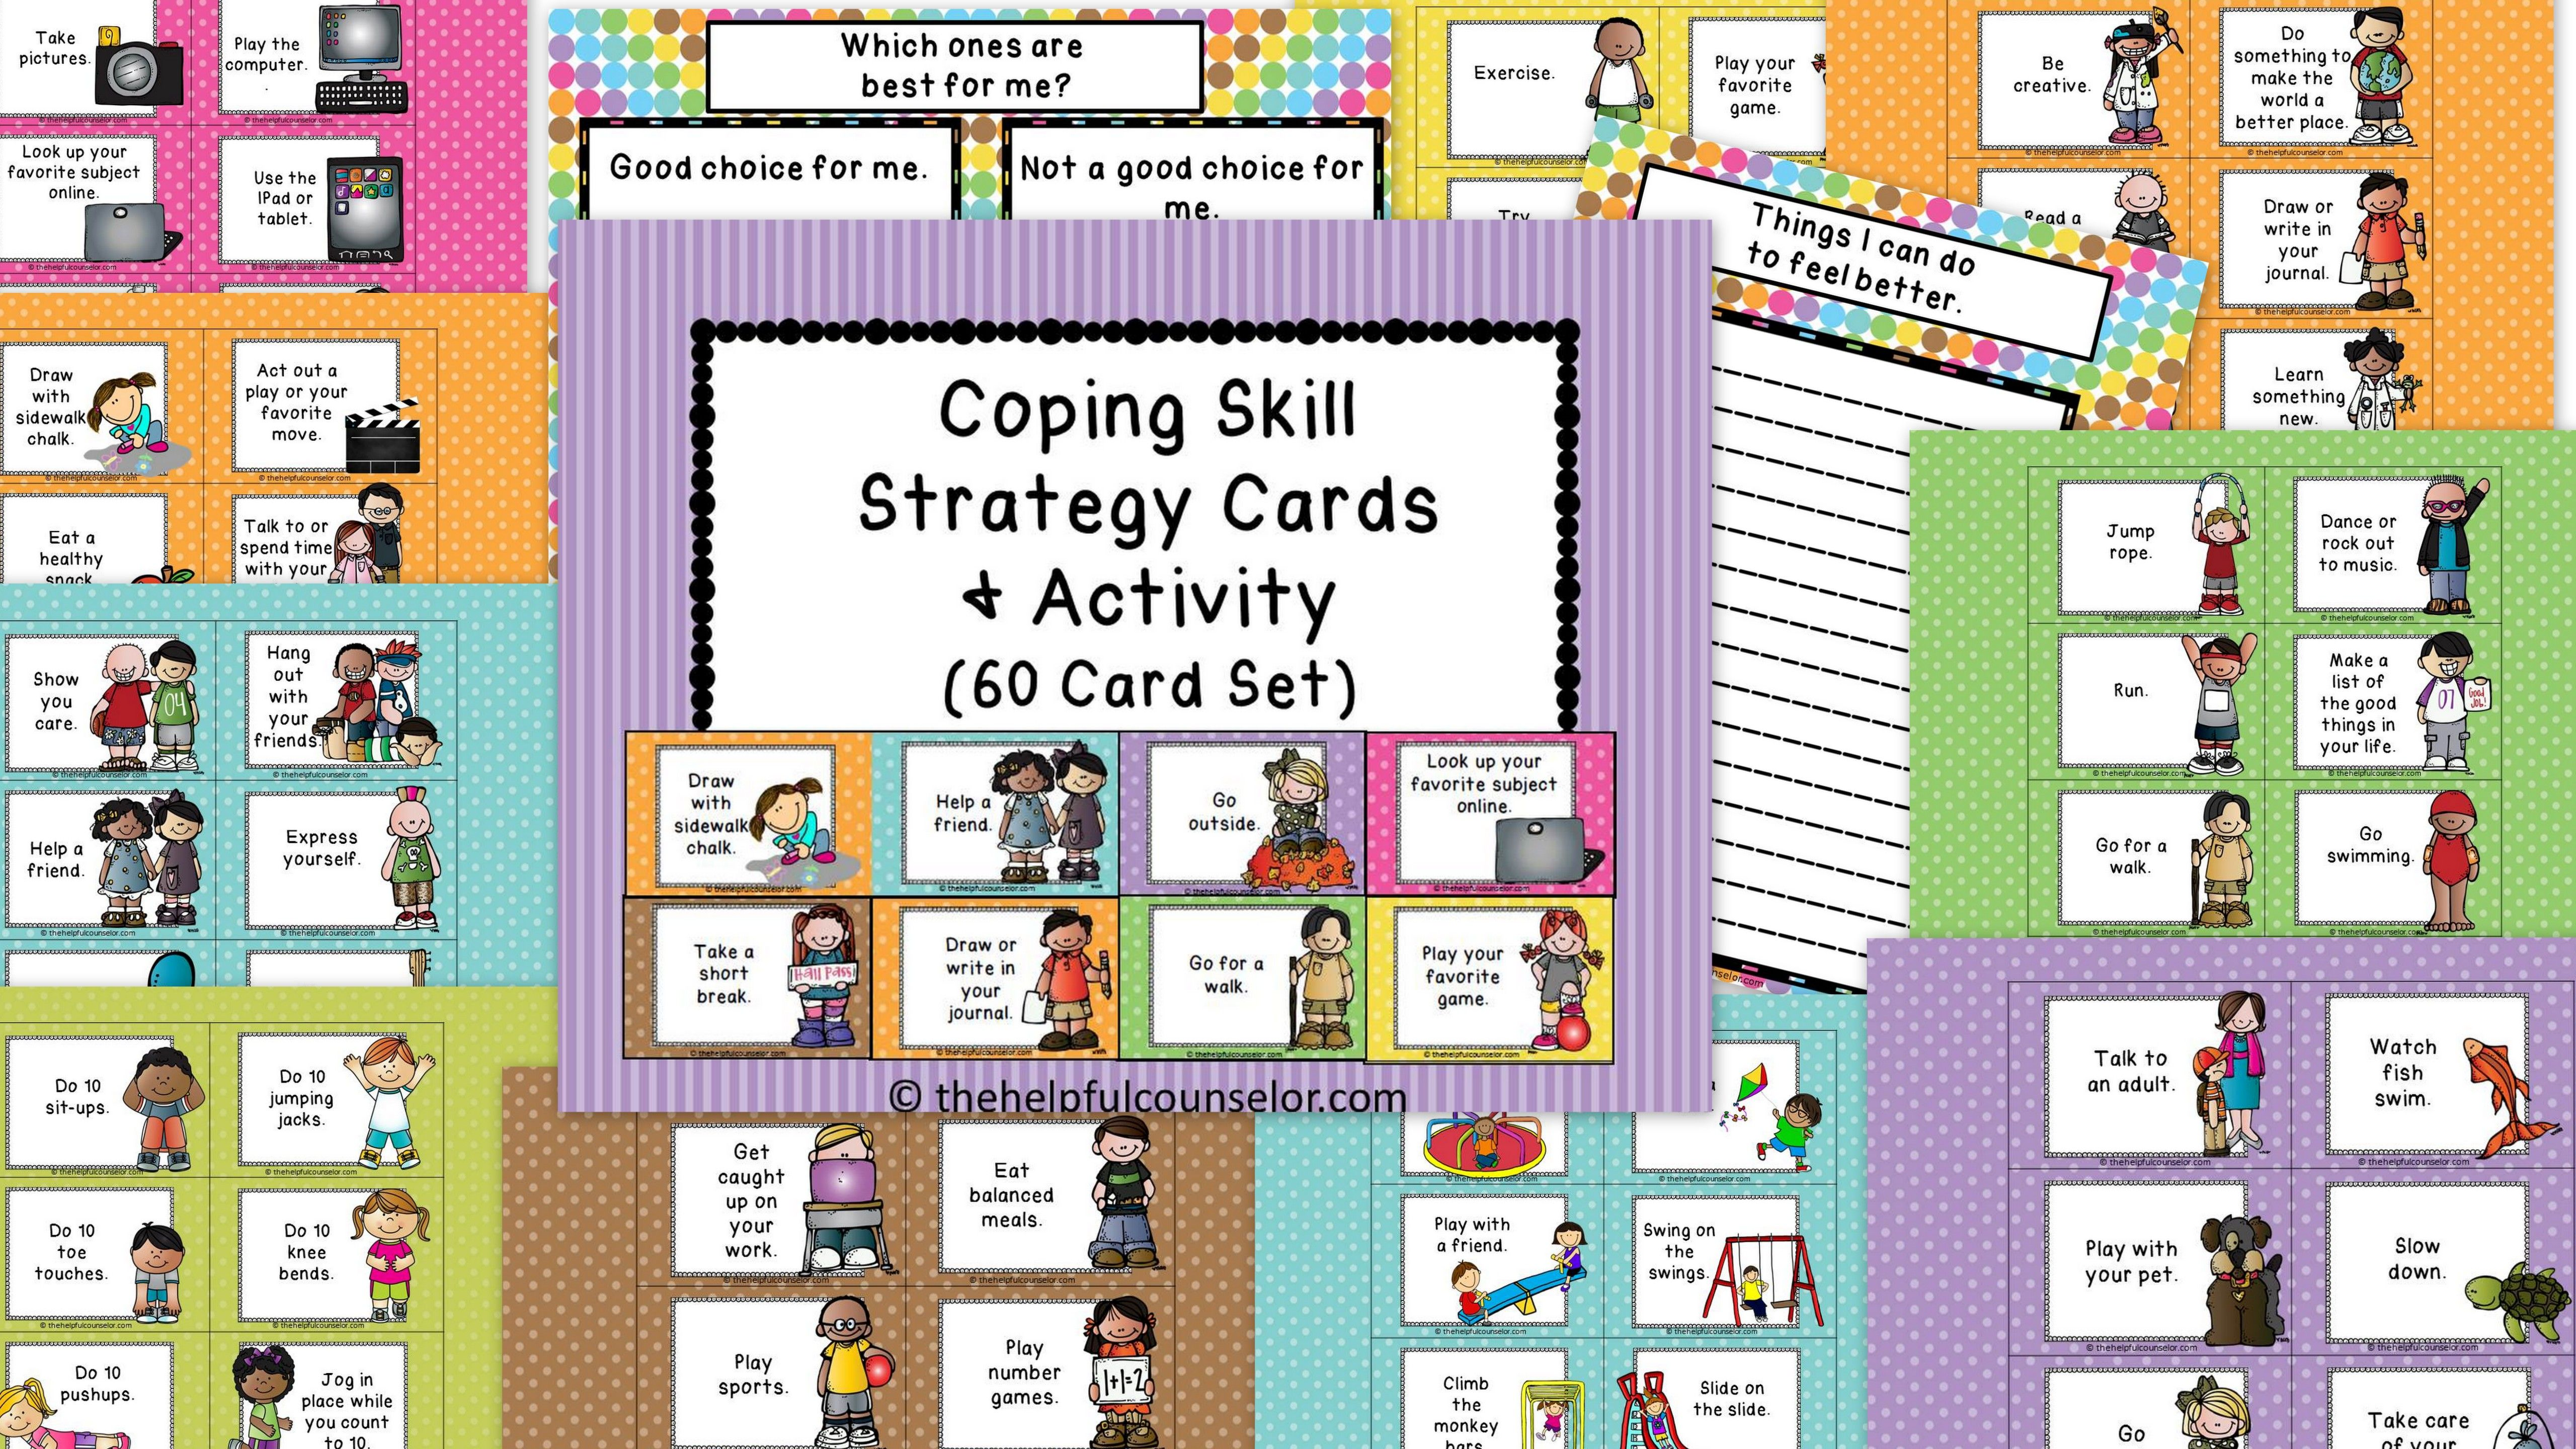 Coping Skills Making Good Choices Activity